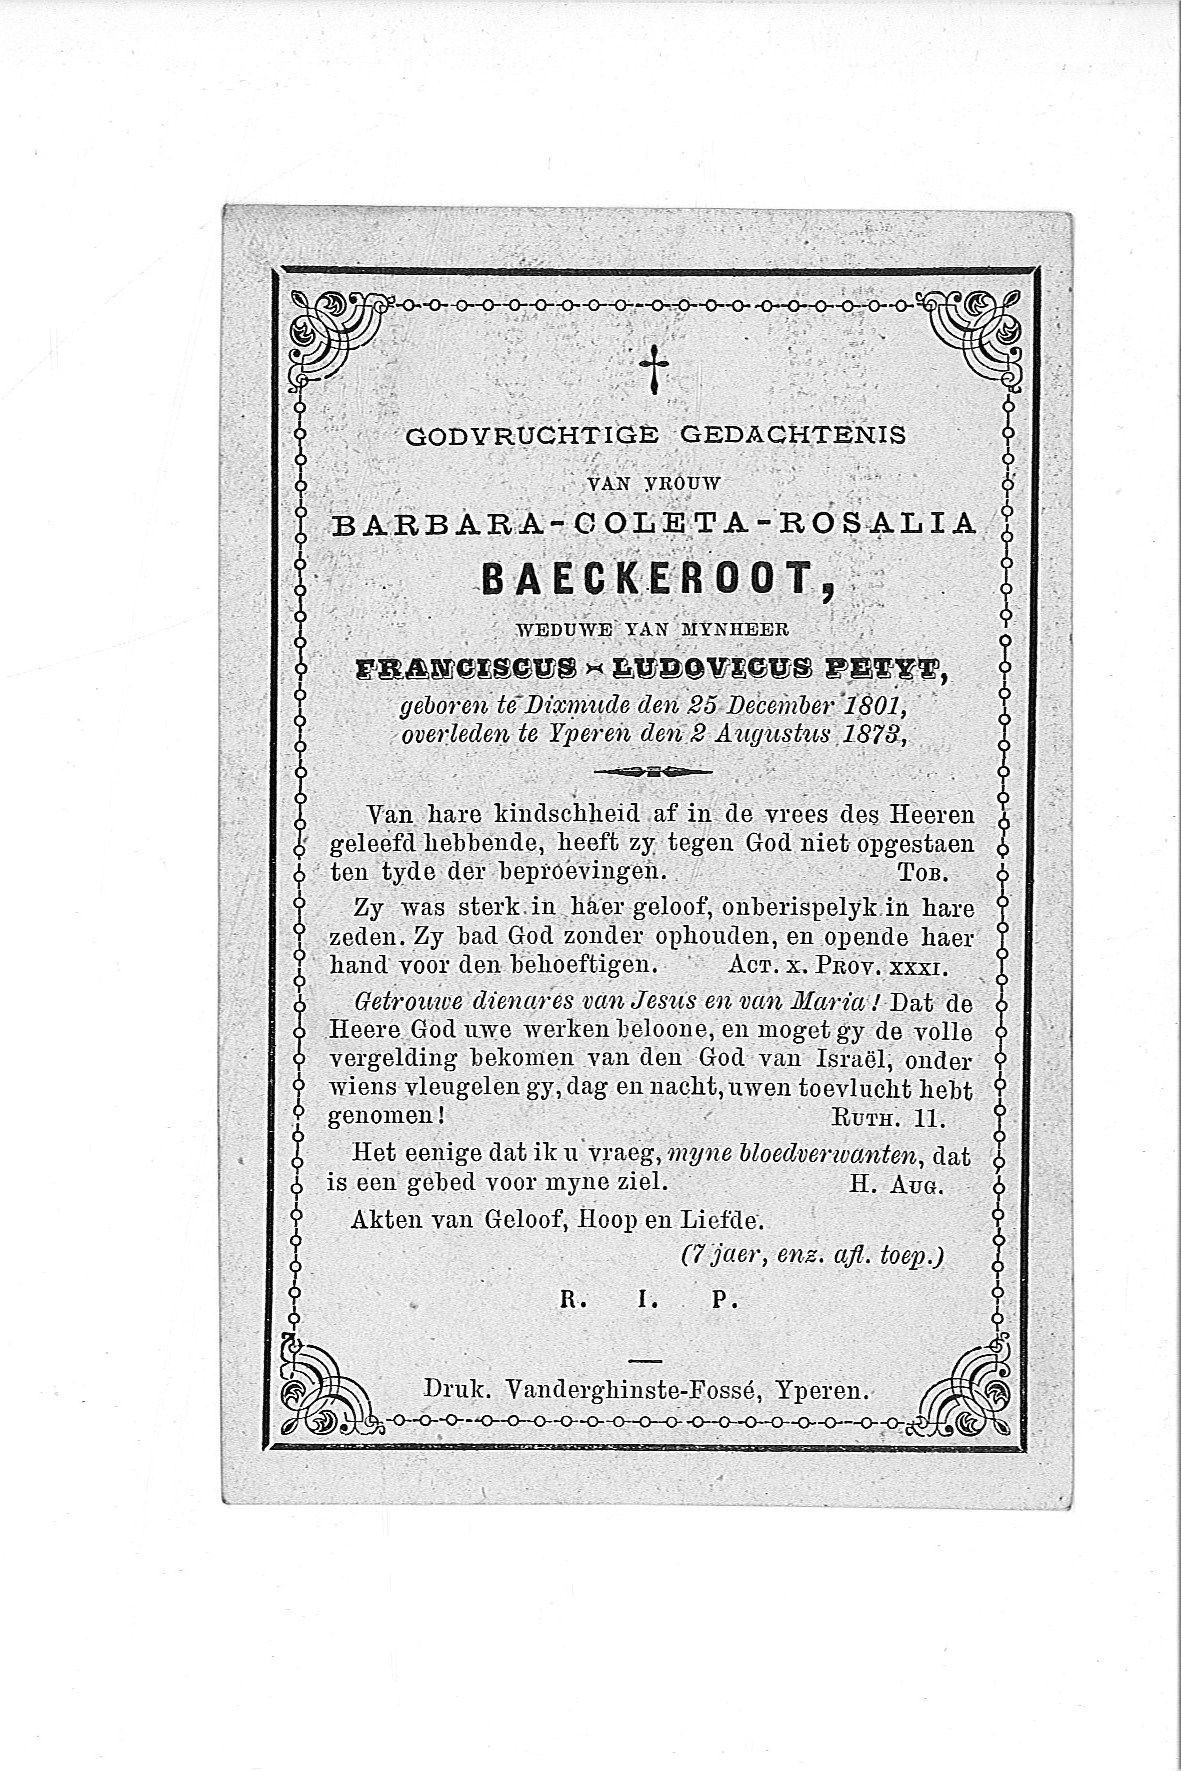 barbara-coleta-rosalia(1874)20090430094548_00011.jpg